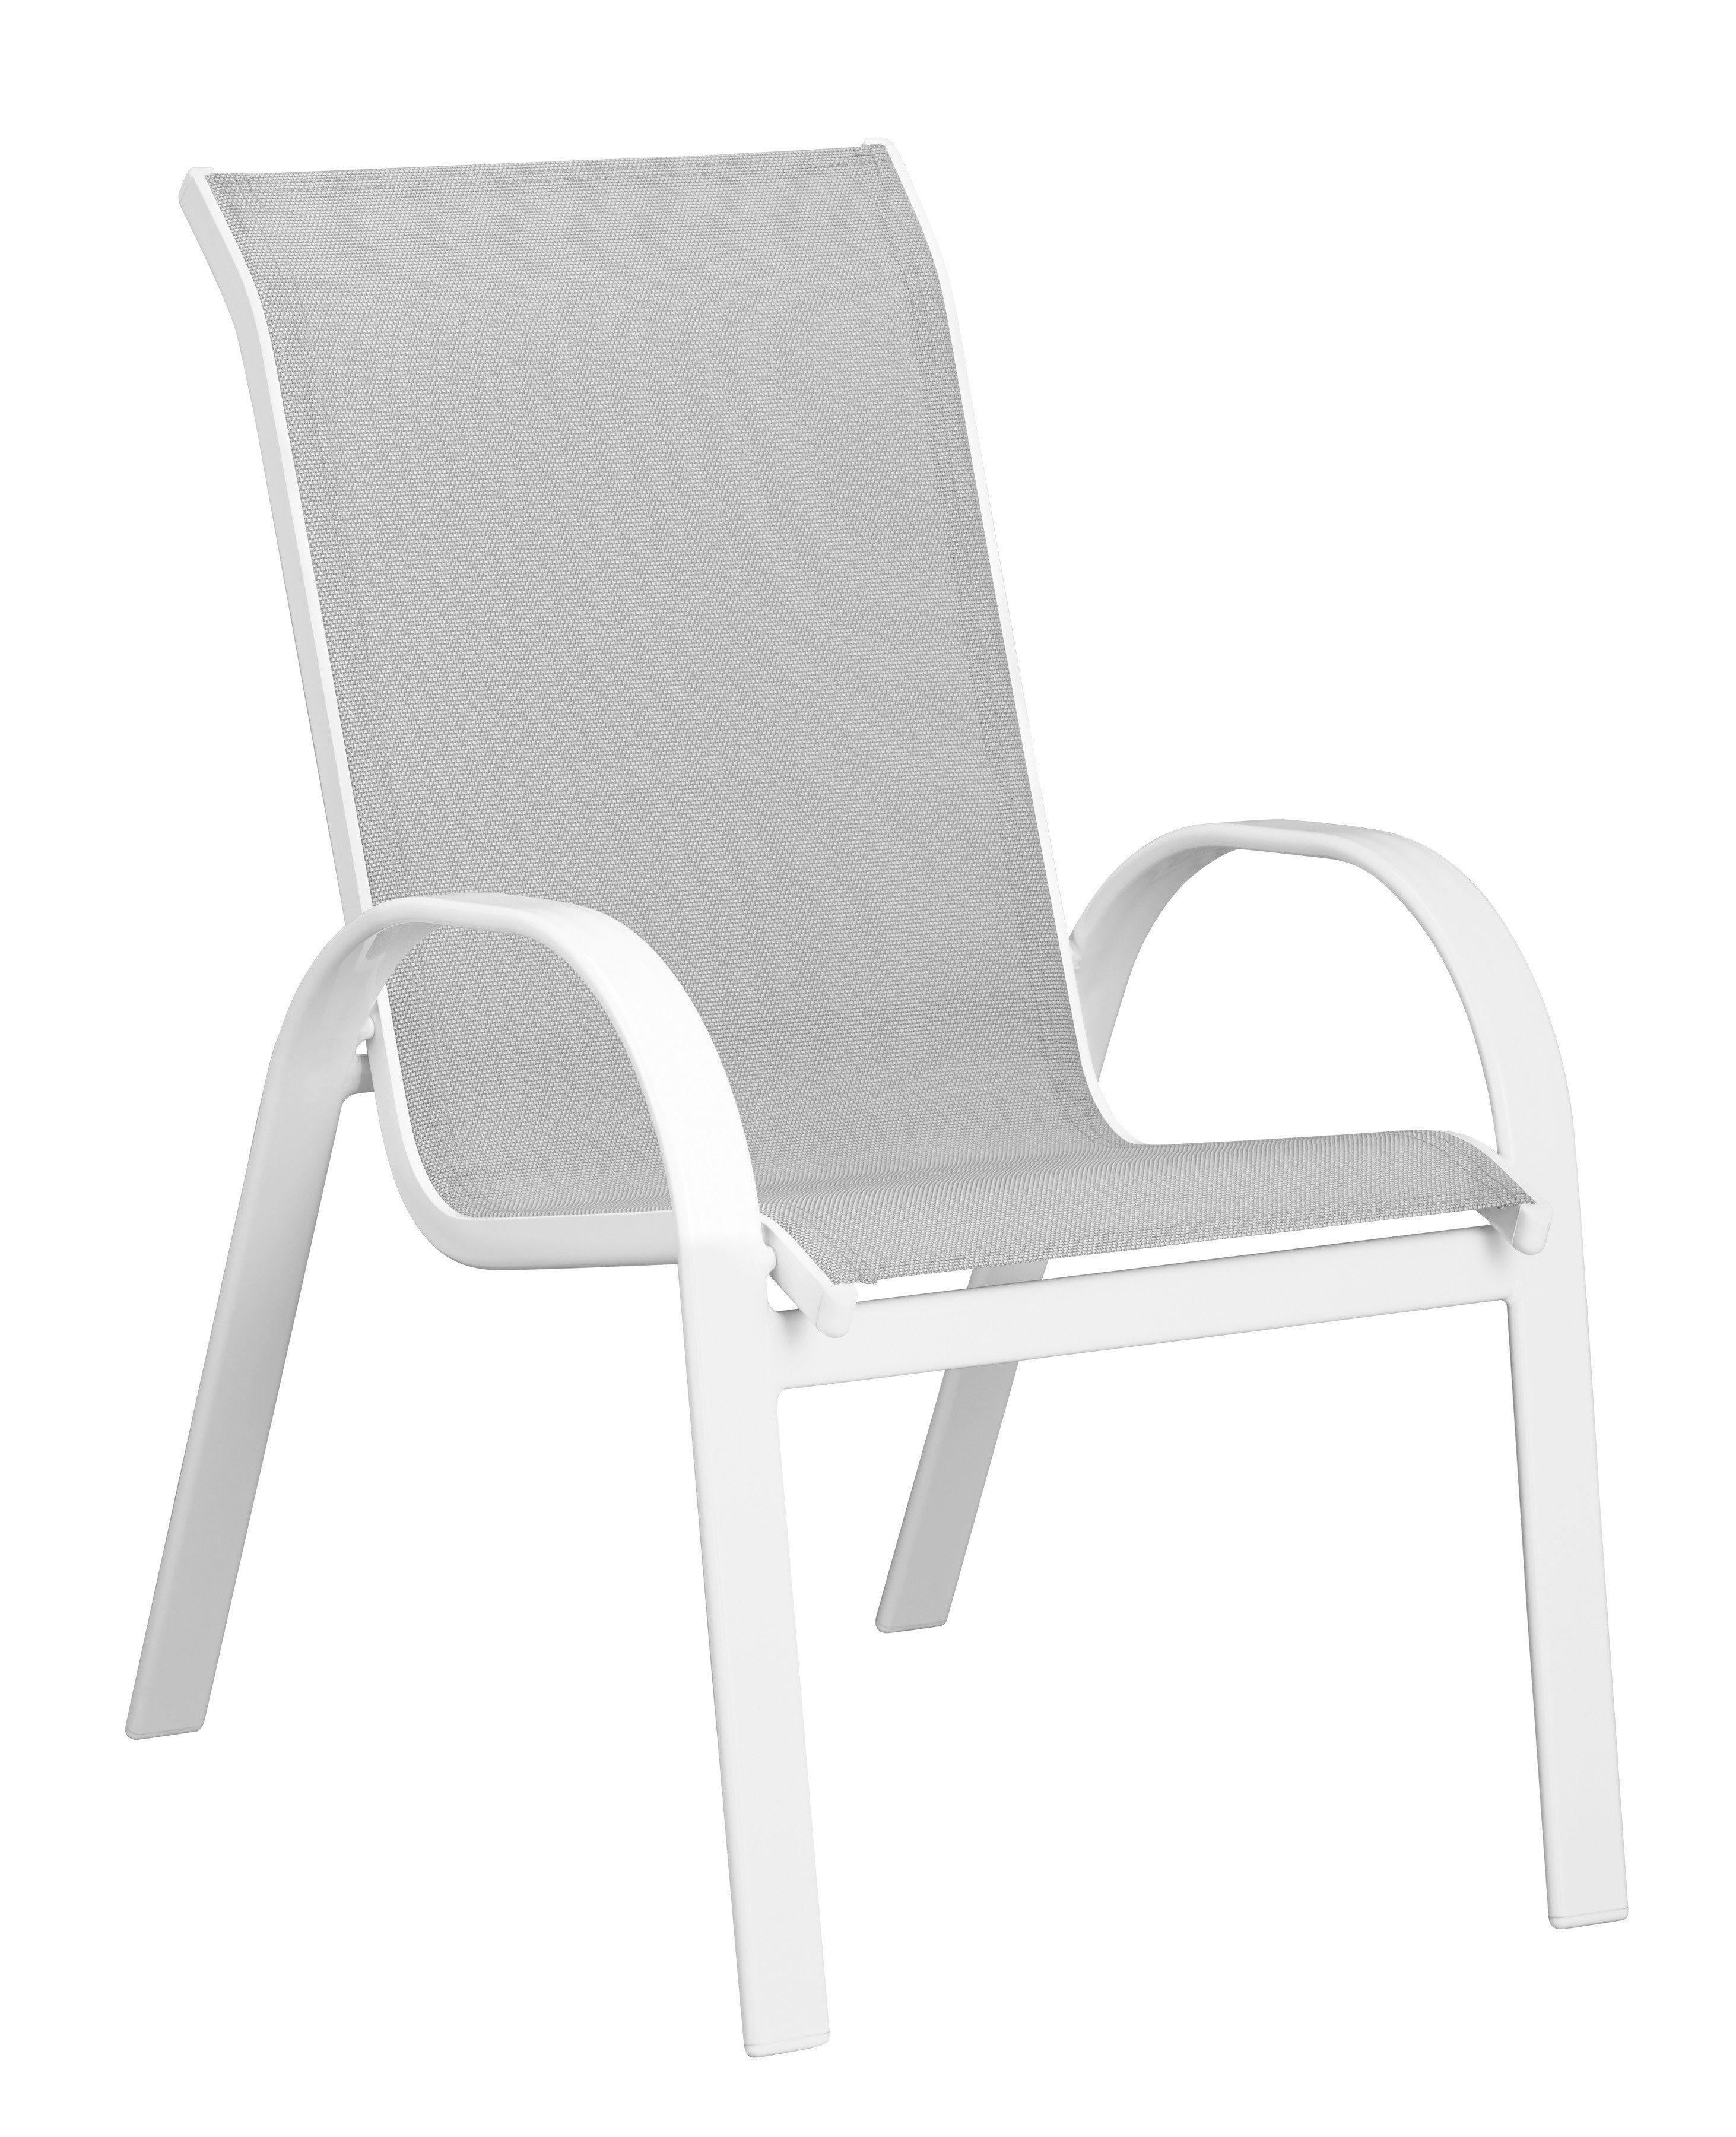 MERXX Gartenstuhl »Carrara«, (2er Set), Alu/Textil, stapelbar, weiß